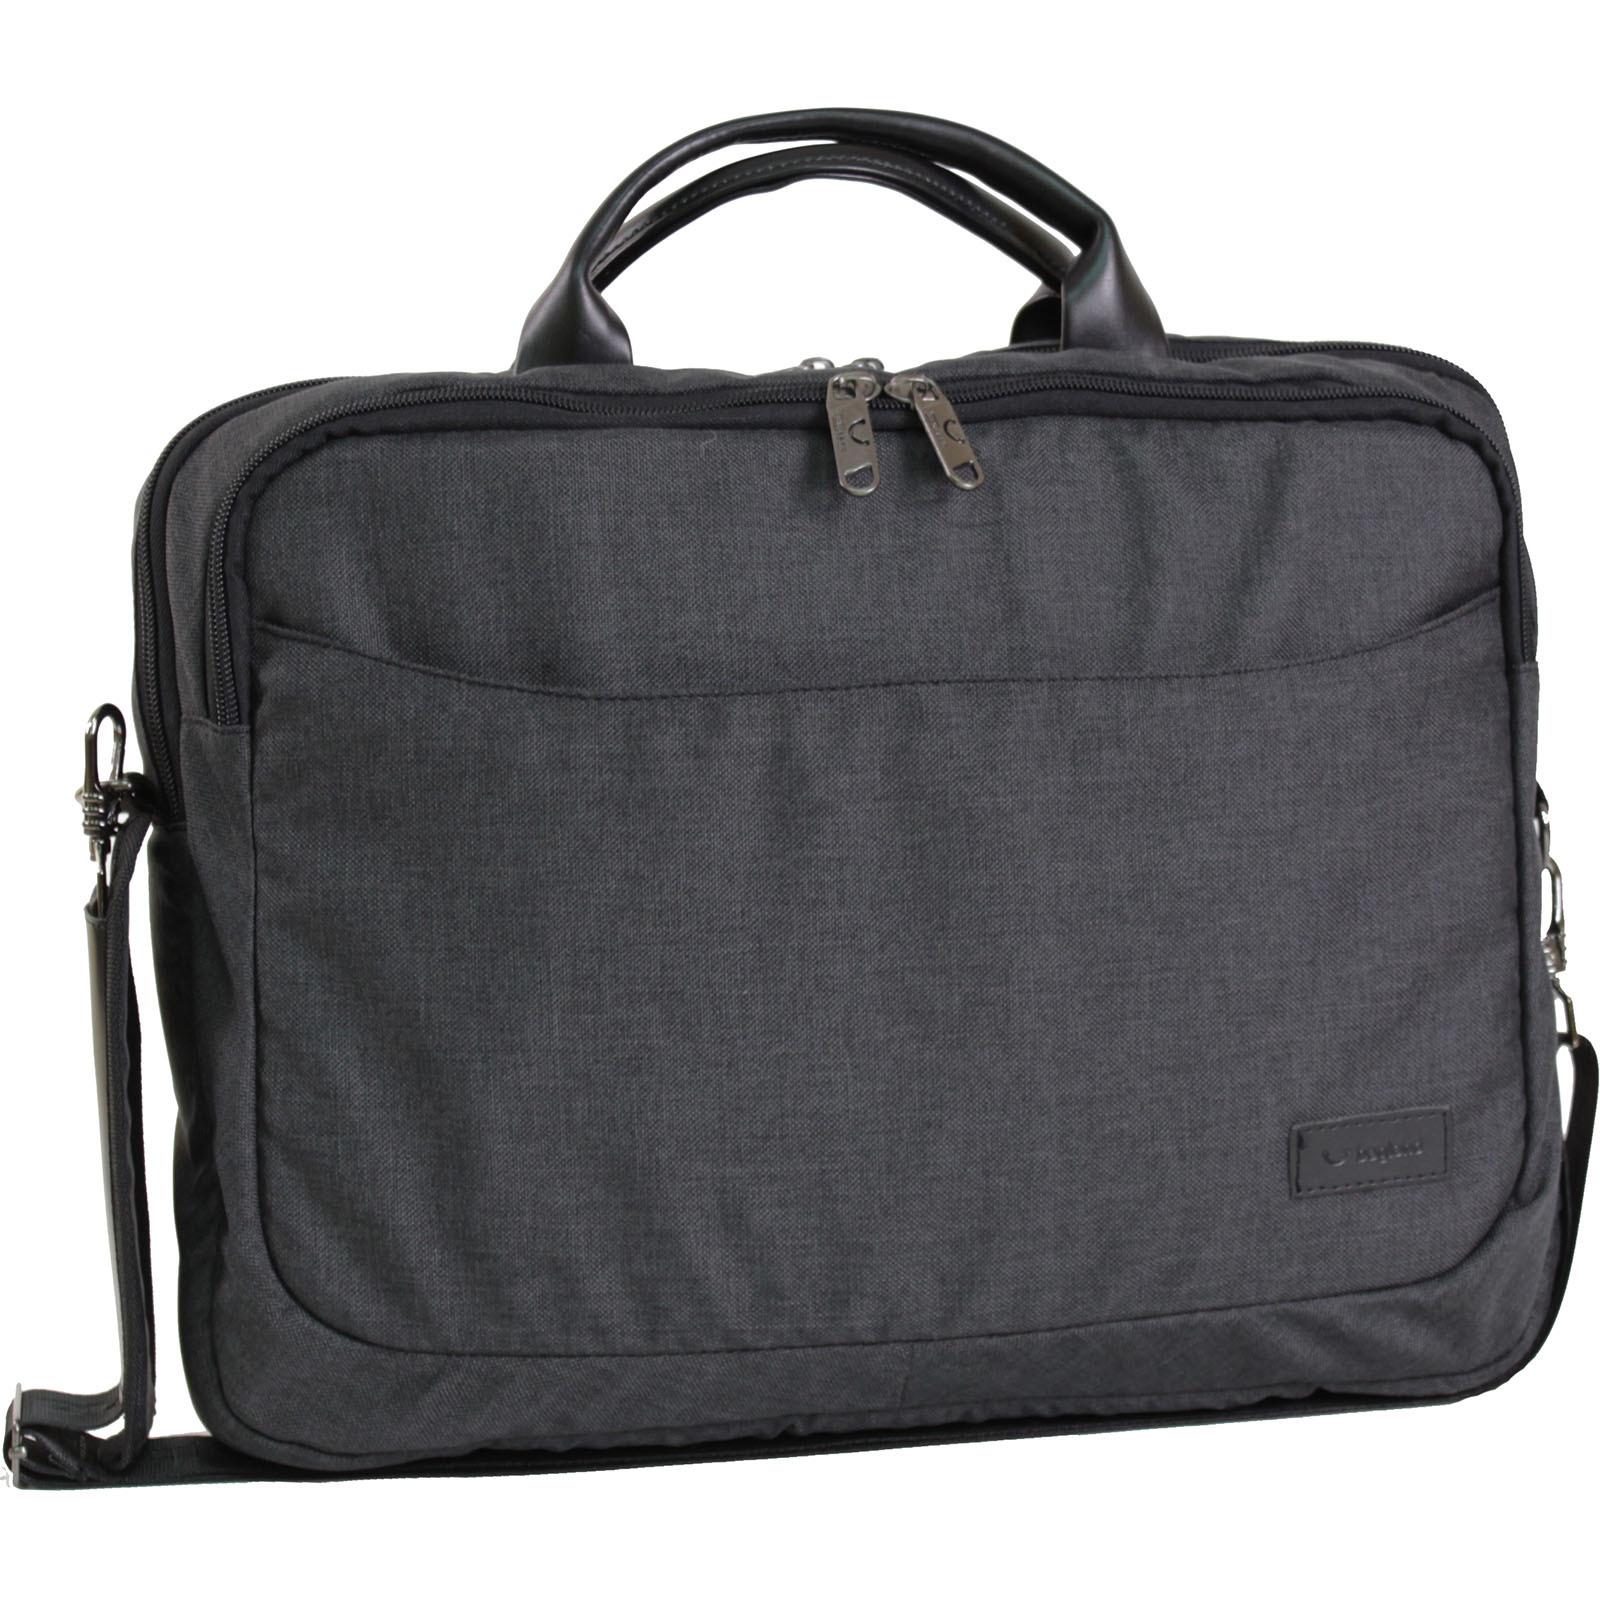 Сумки для ноутбука Сумка для ноутбука Bagland Fremont 11 л. Чёрный (0042769) IMG_0826.JPG